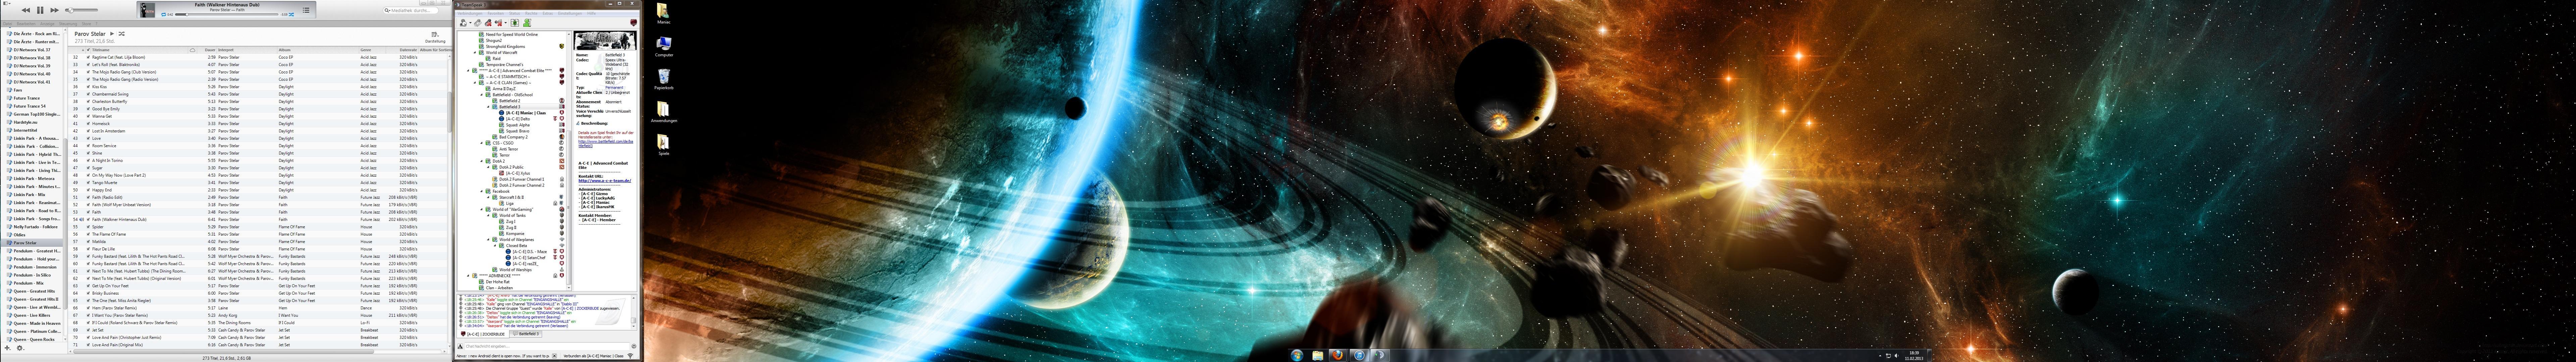 desktop_new.jpg